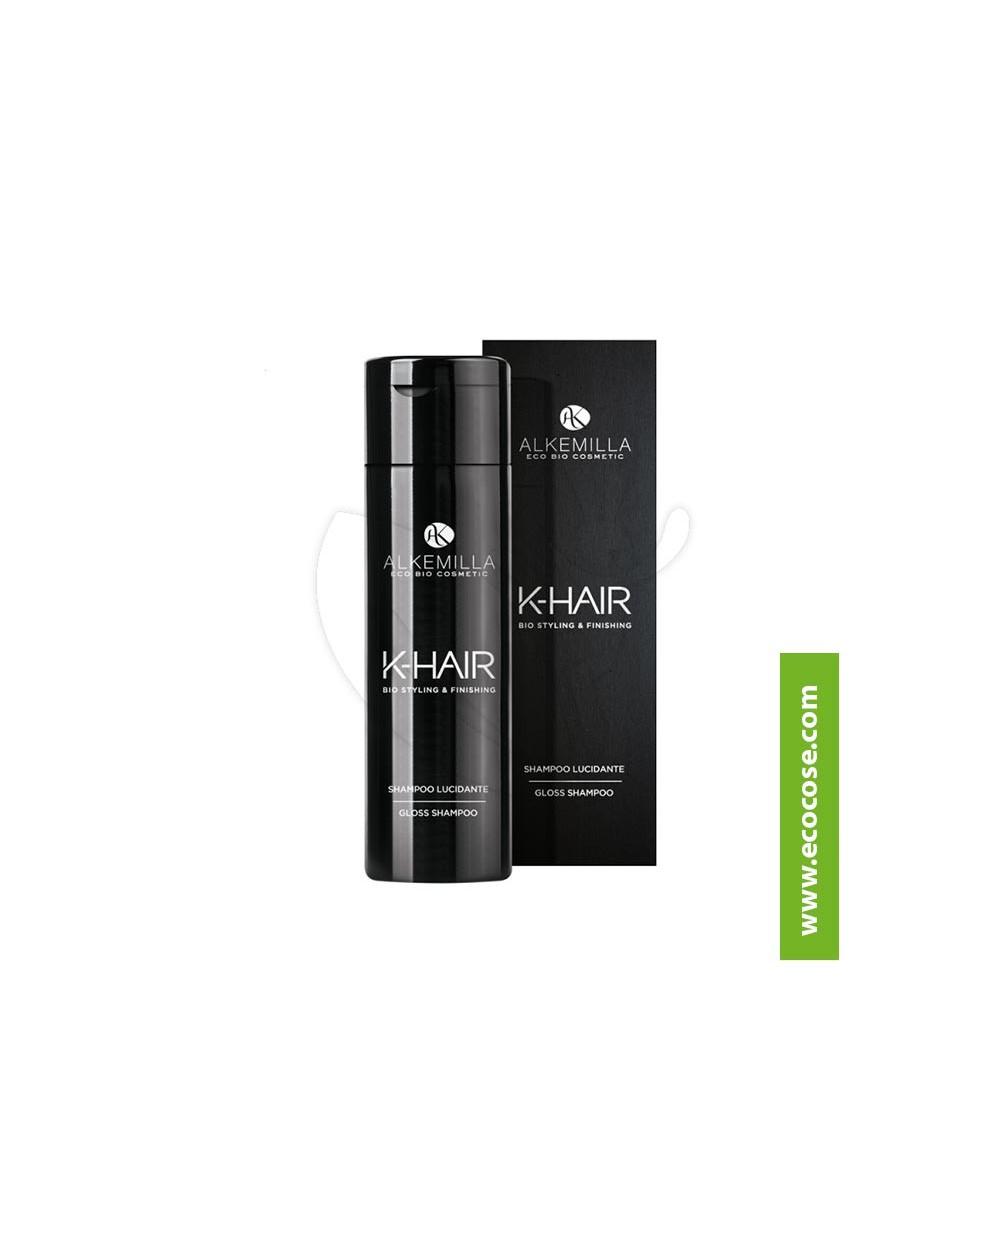 Alkemilla - K-HAIR - Shampoo Lucidante